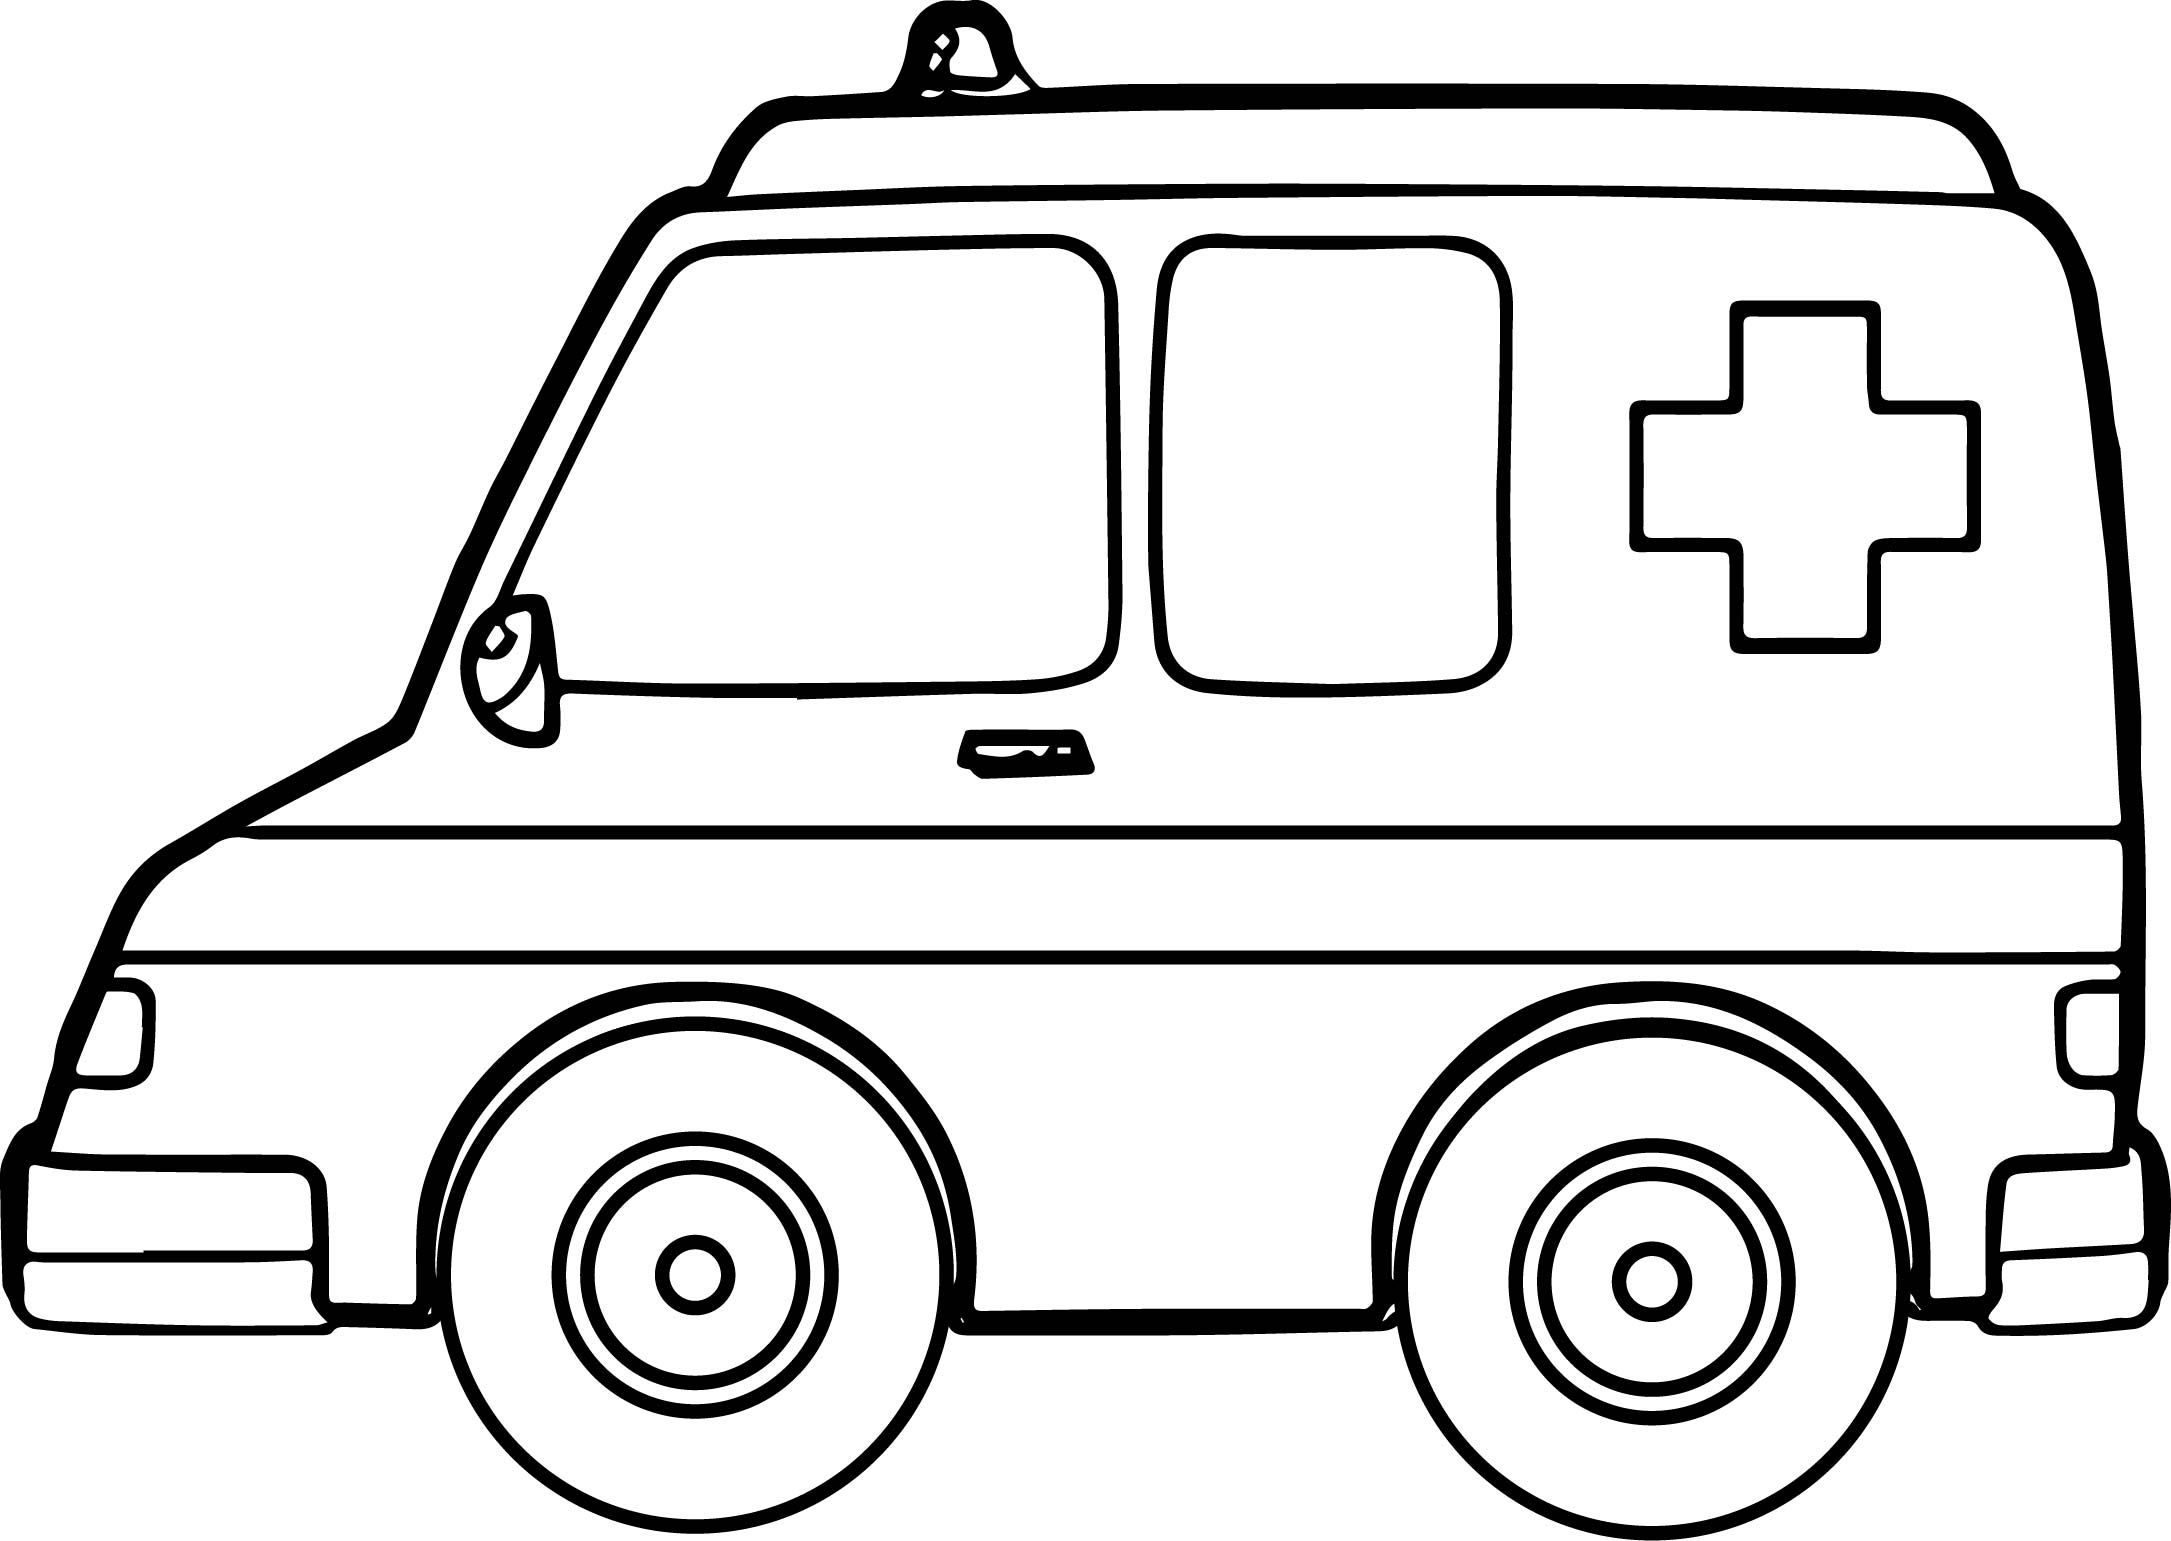 One Ambulance Coloring Page | Wecoloringpage.com